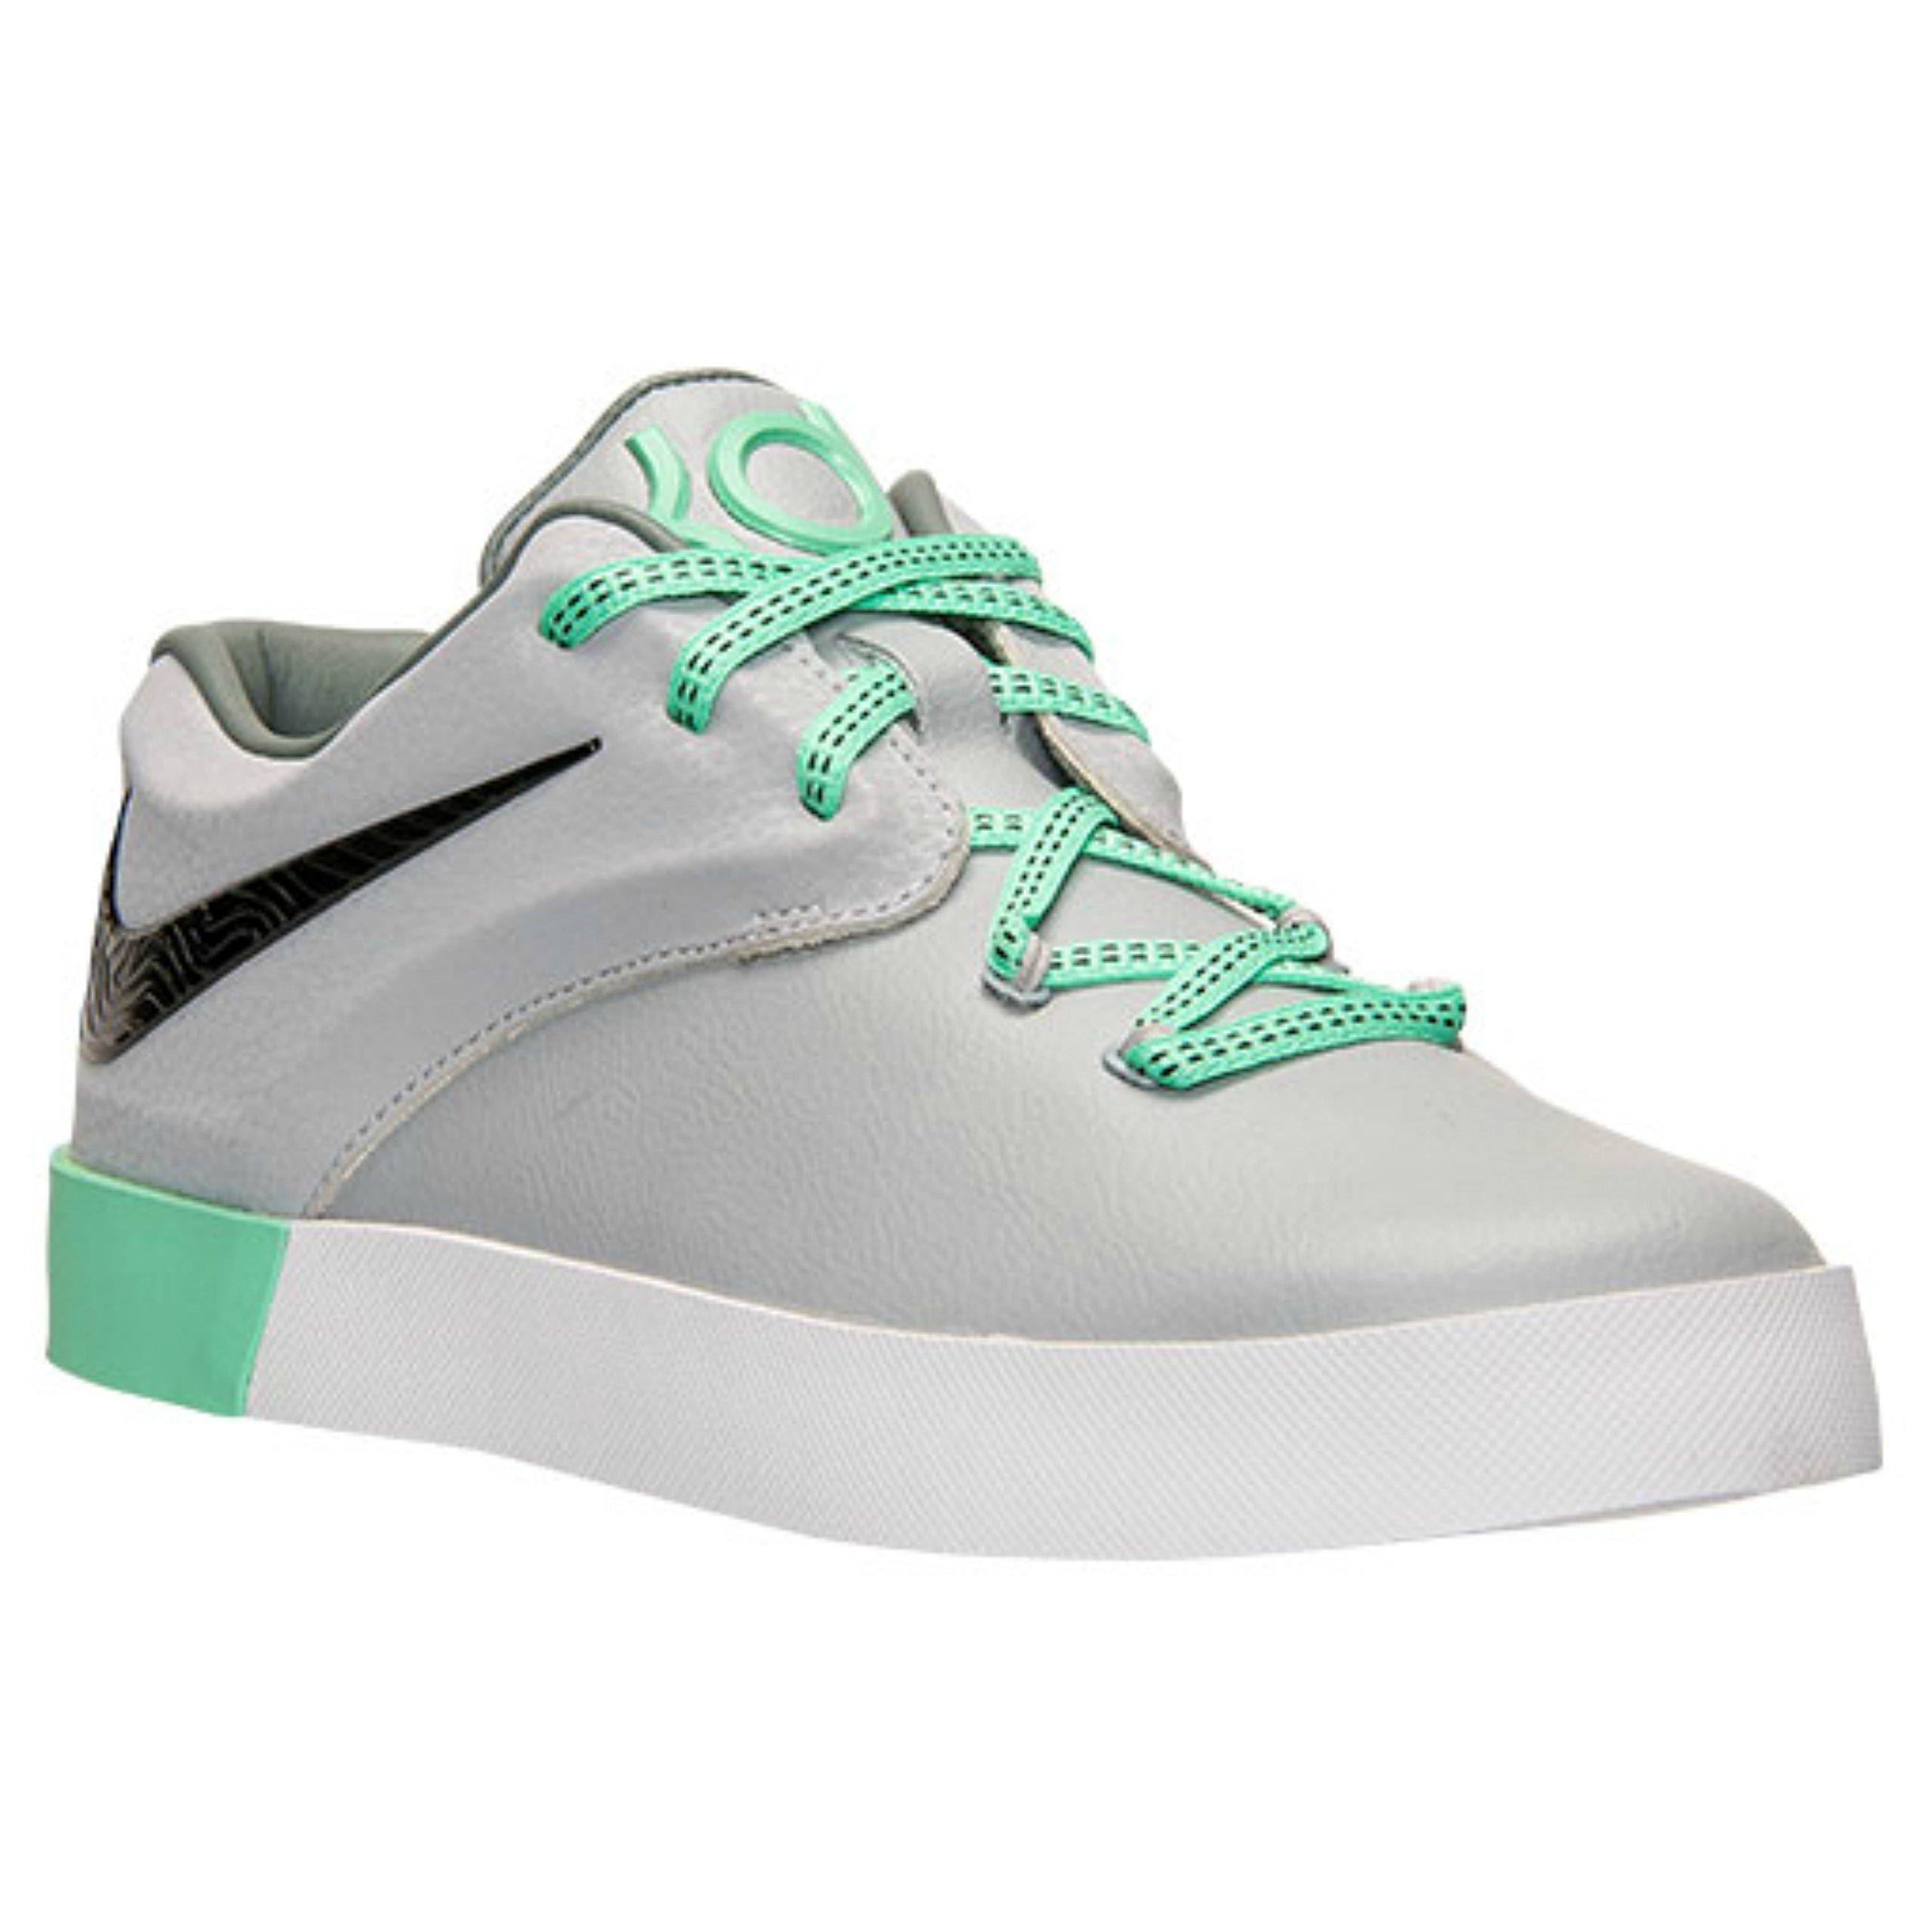 47e3539c1883 Galleon - Nike KD Vulc 2 Basketball Shoes BIG YOUTH Boys Grade School Wolf  Grey (6)